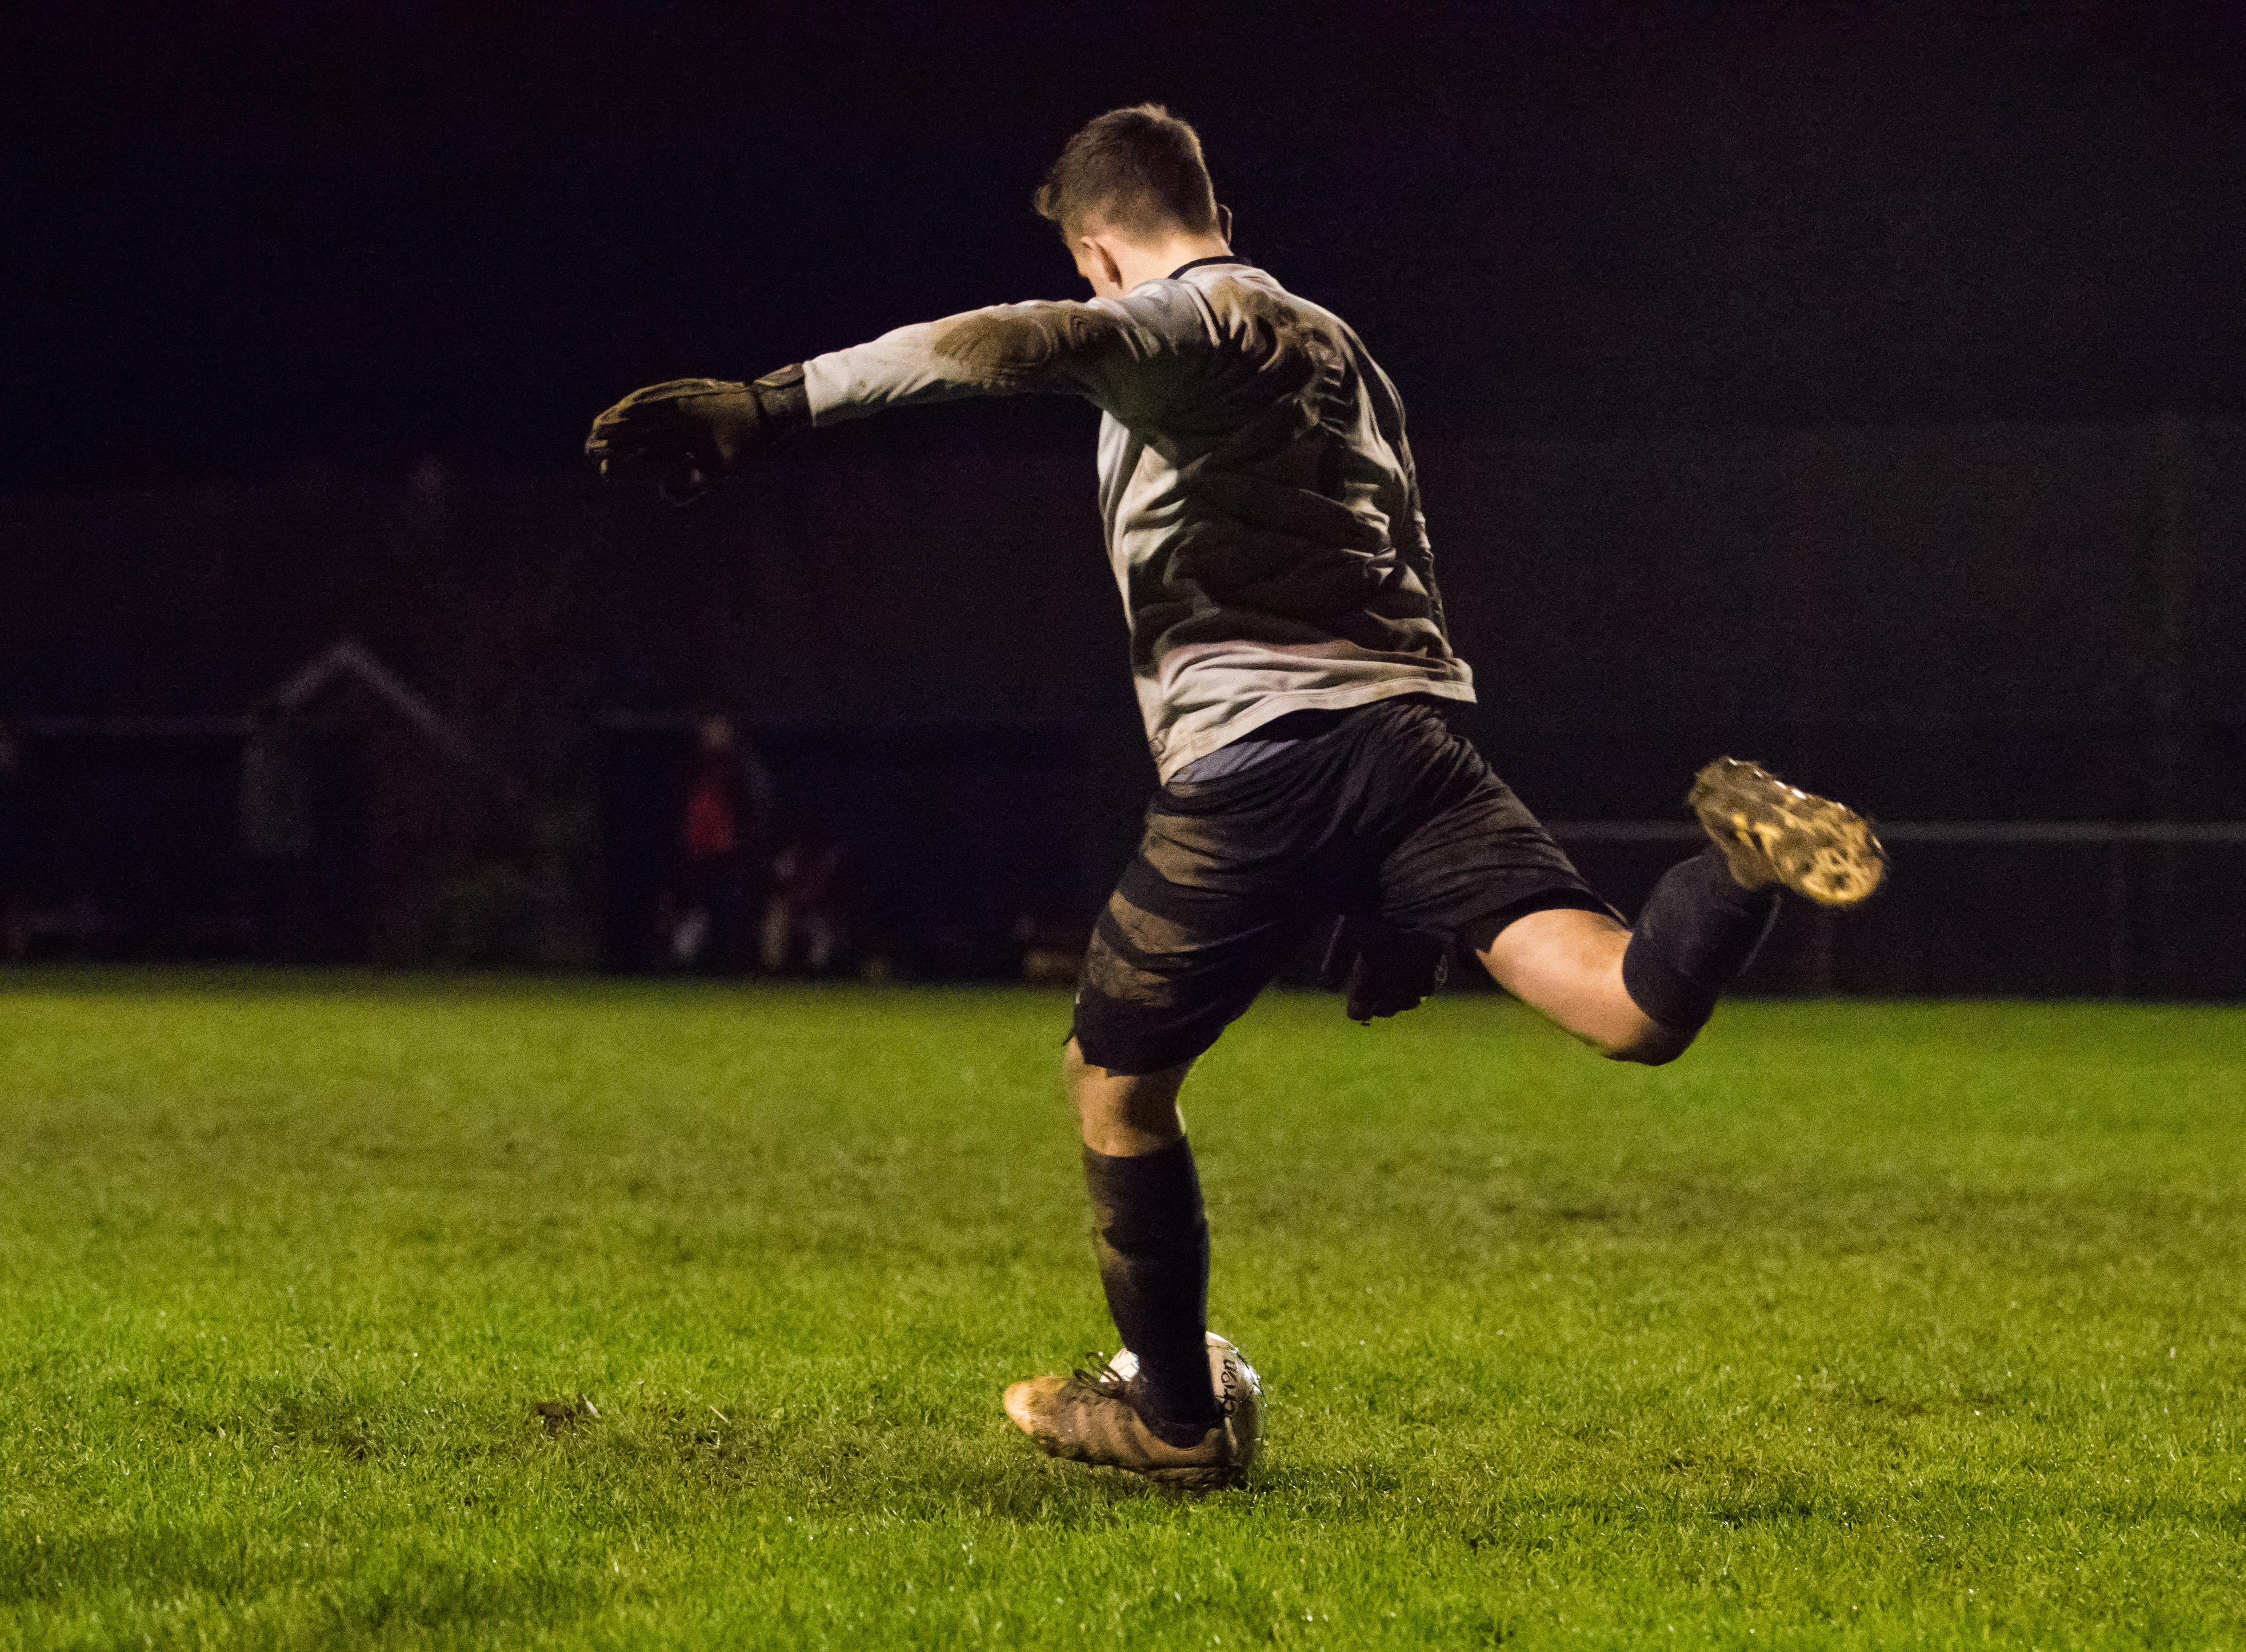 Mile Oak U21s vs Southwick FC U21s 14.12.17 43